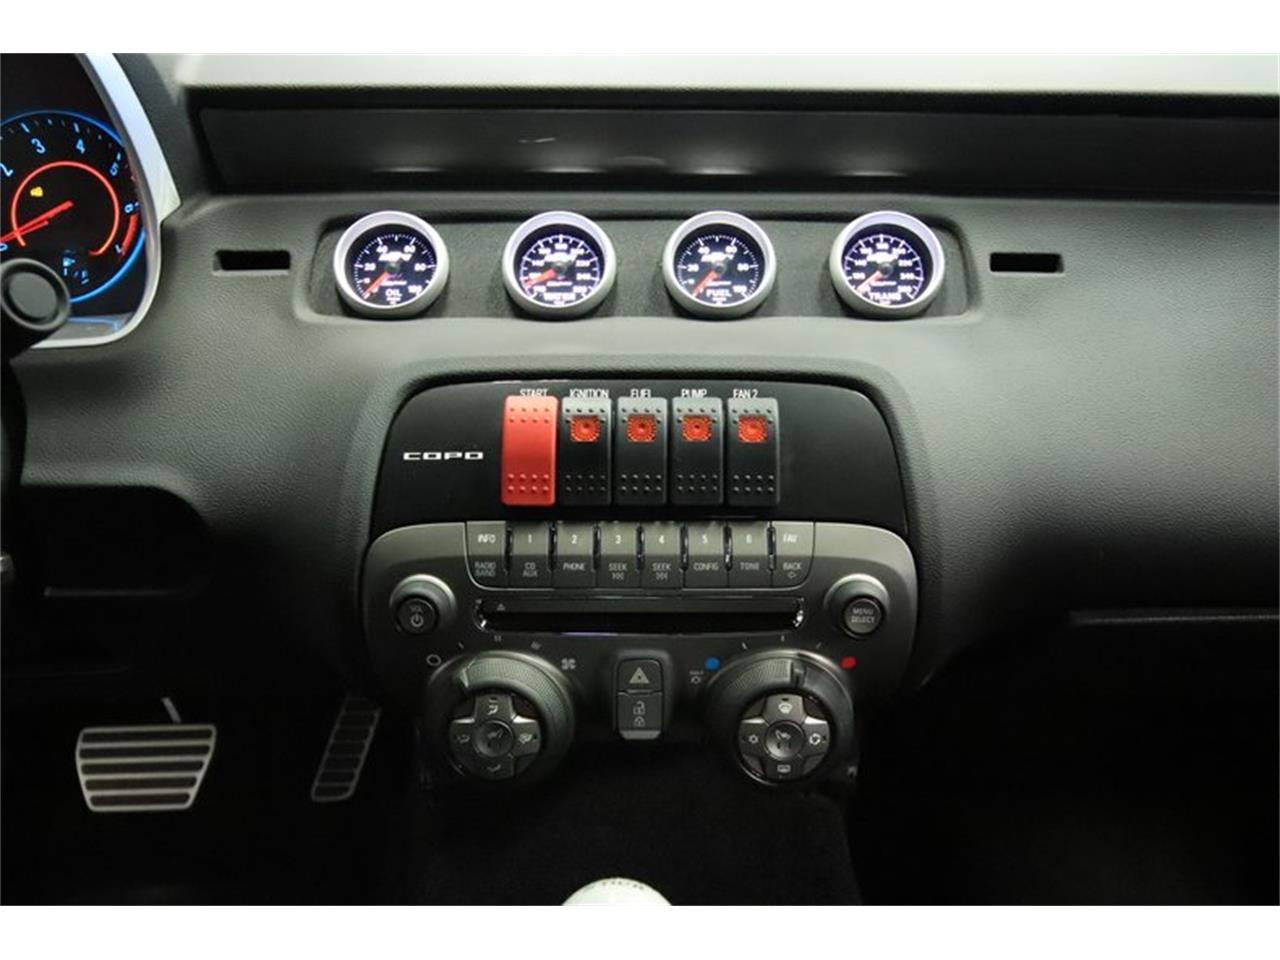 2012 Chevrolet Camaro (CC-1203638) for sale in Mesa, Arizona